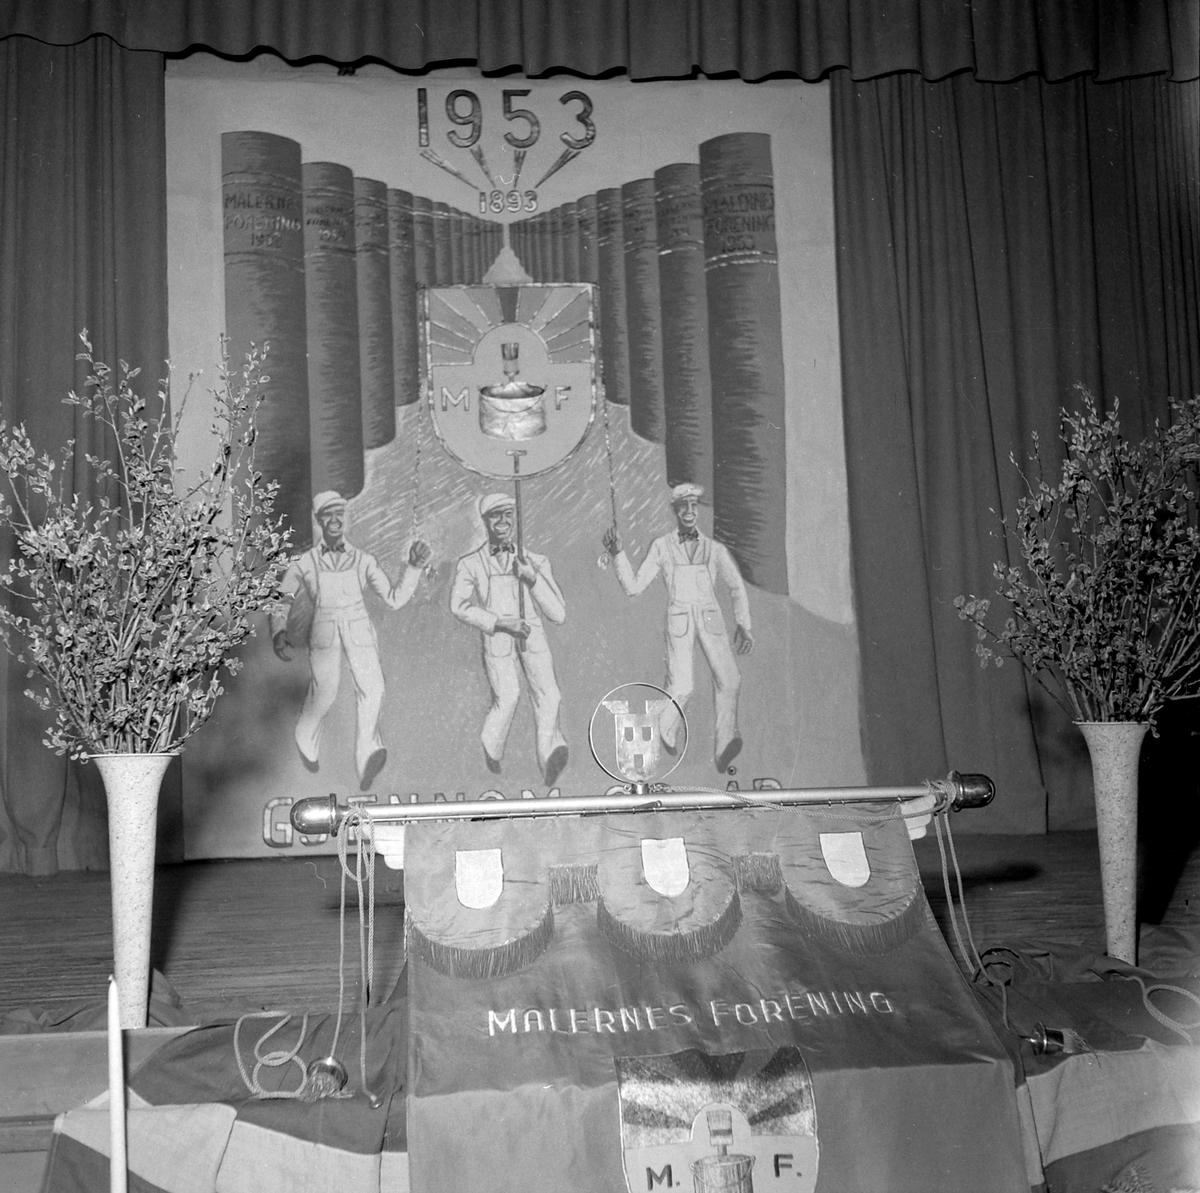 Malernes forening 60 års jubileumsfest